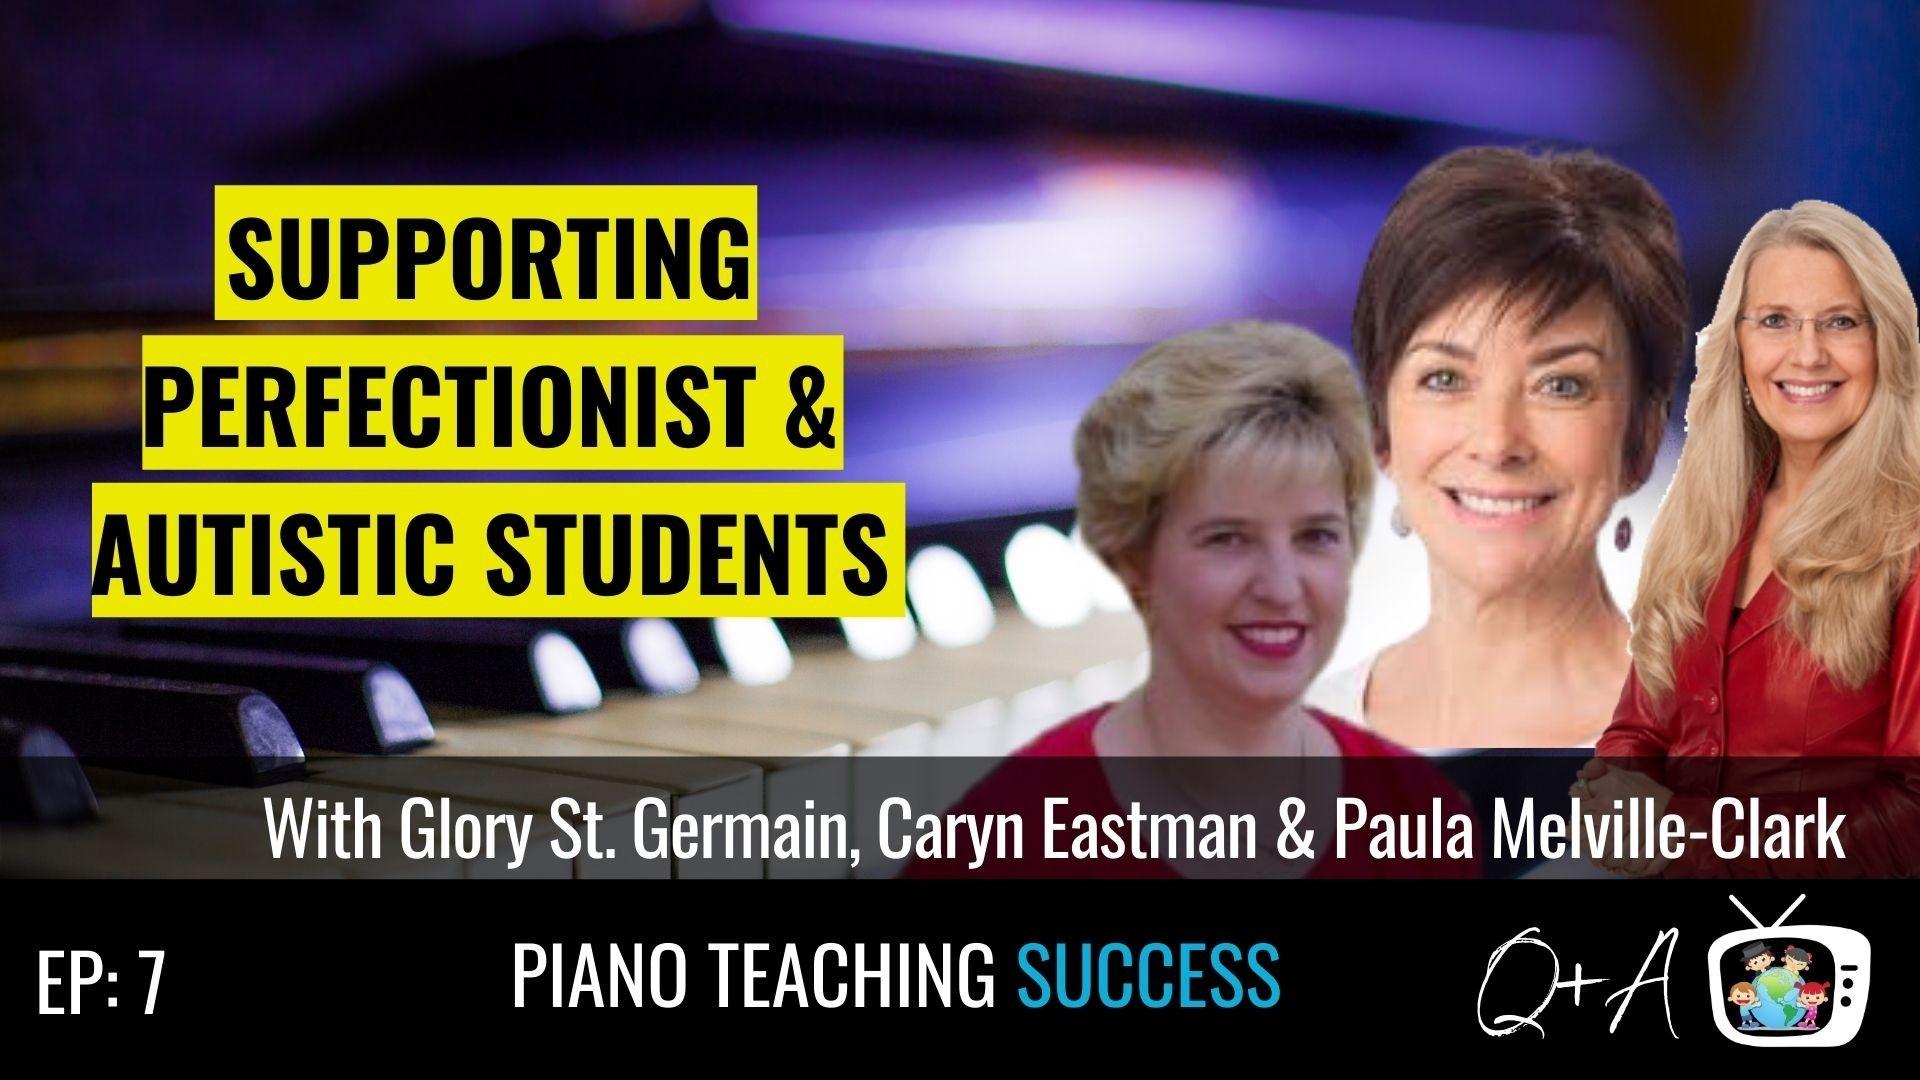 Glory St Germain, Caryn Eastman, Paula Melville-Clark